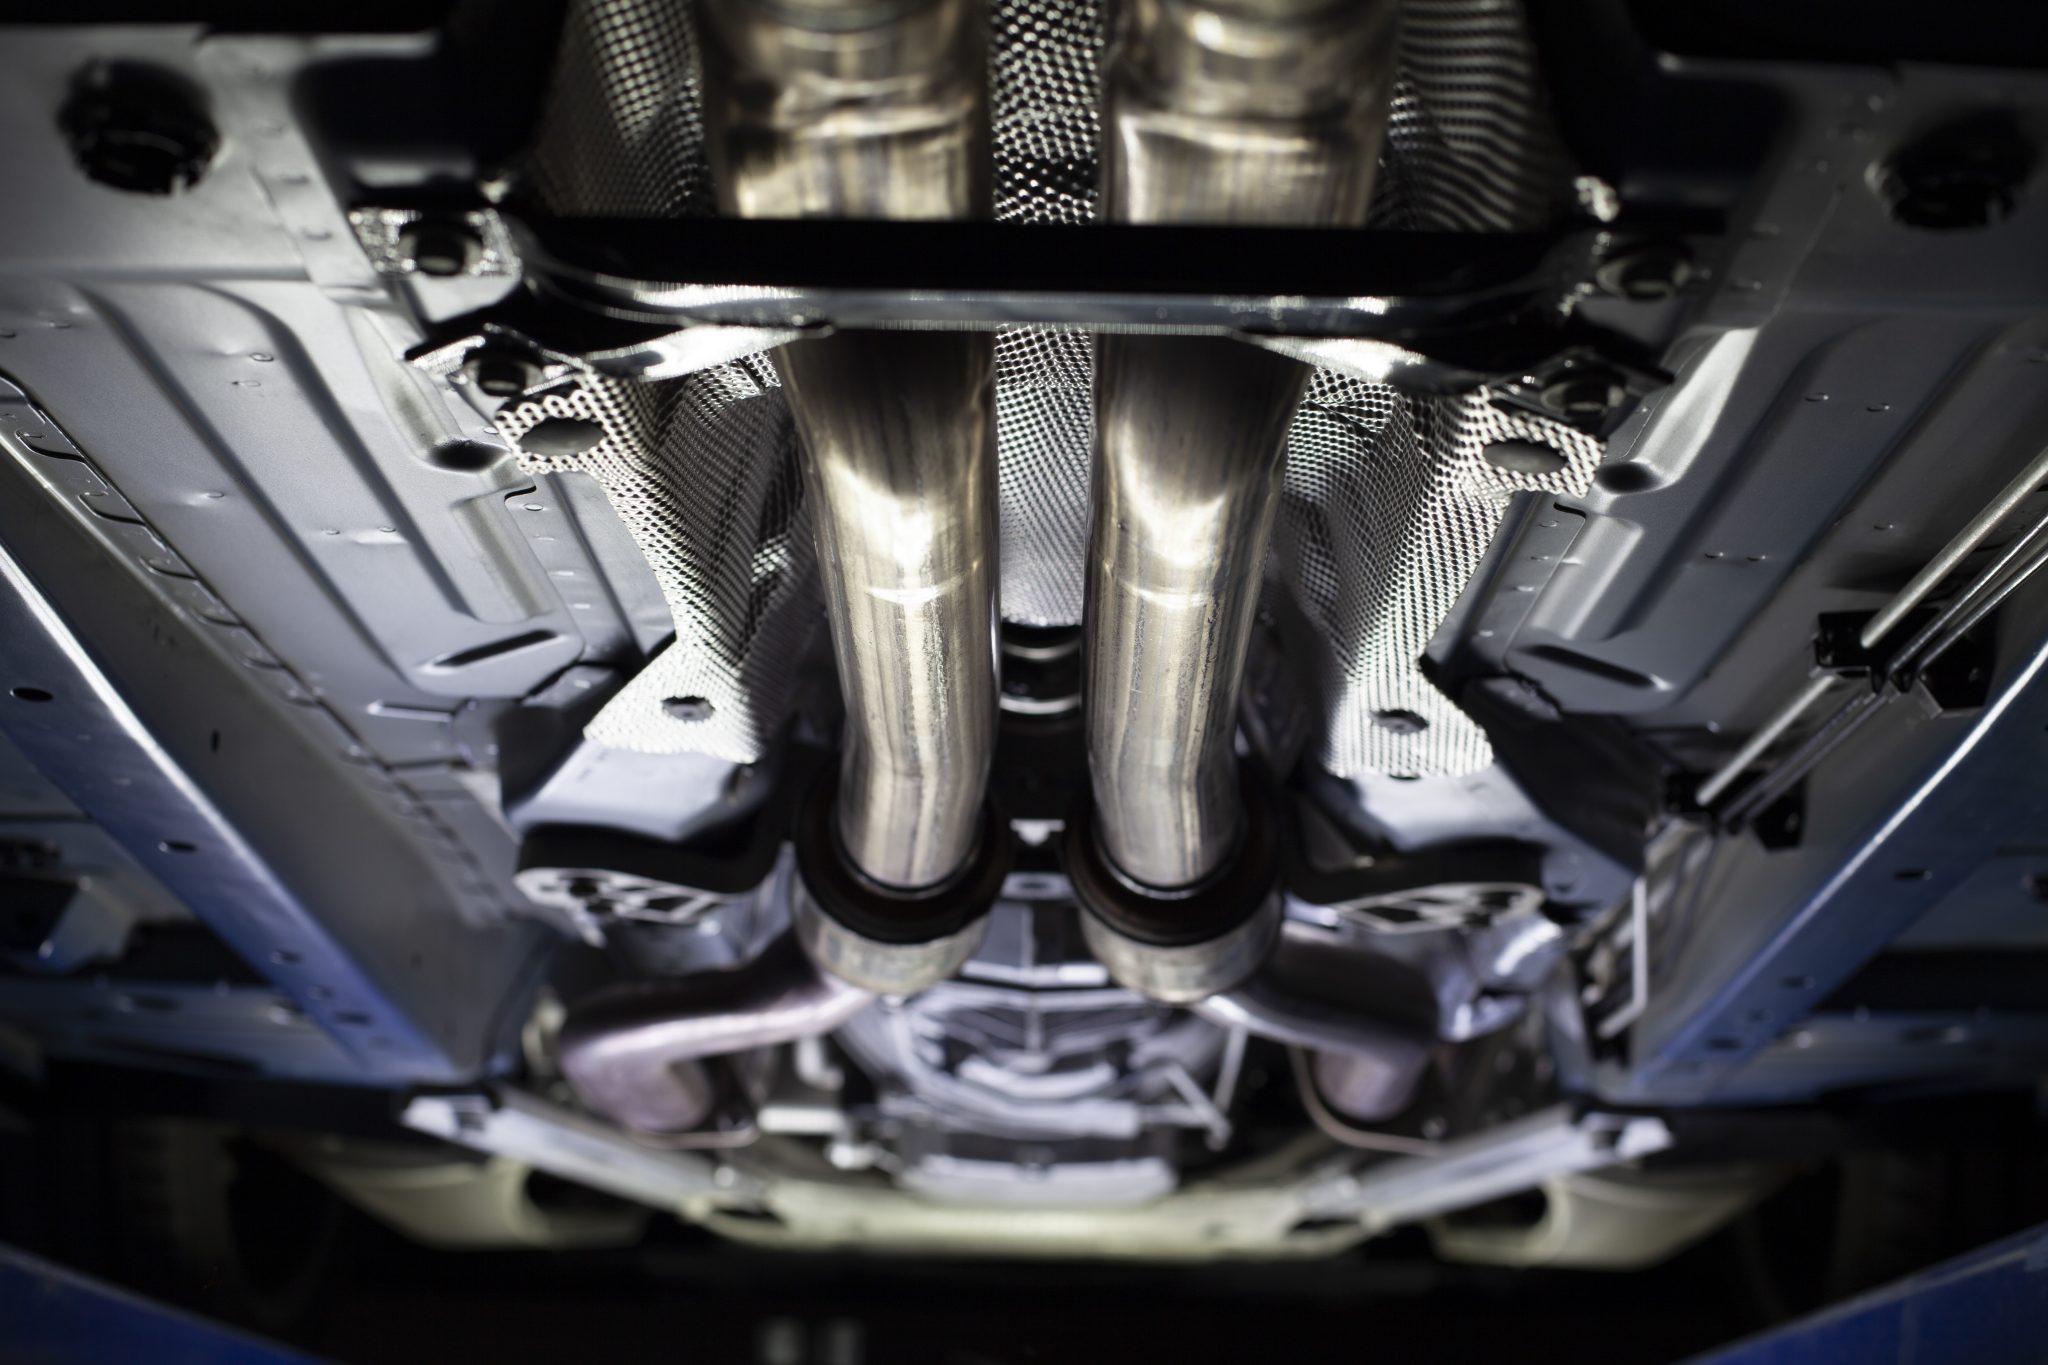 2012 Cadillac CTS-V Wagon underside